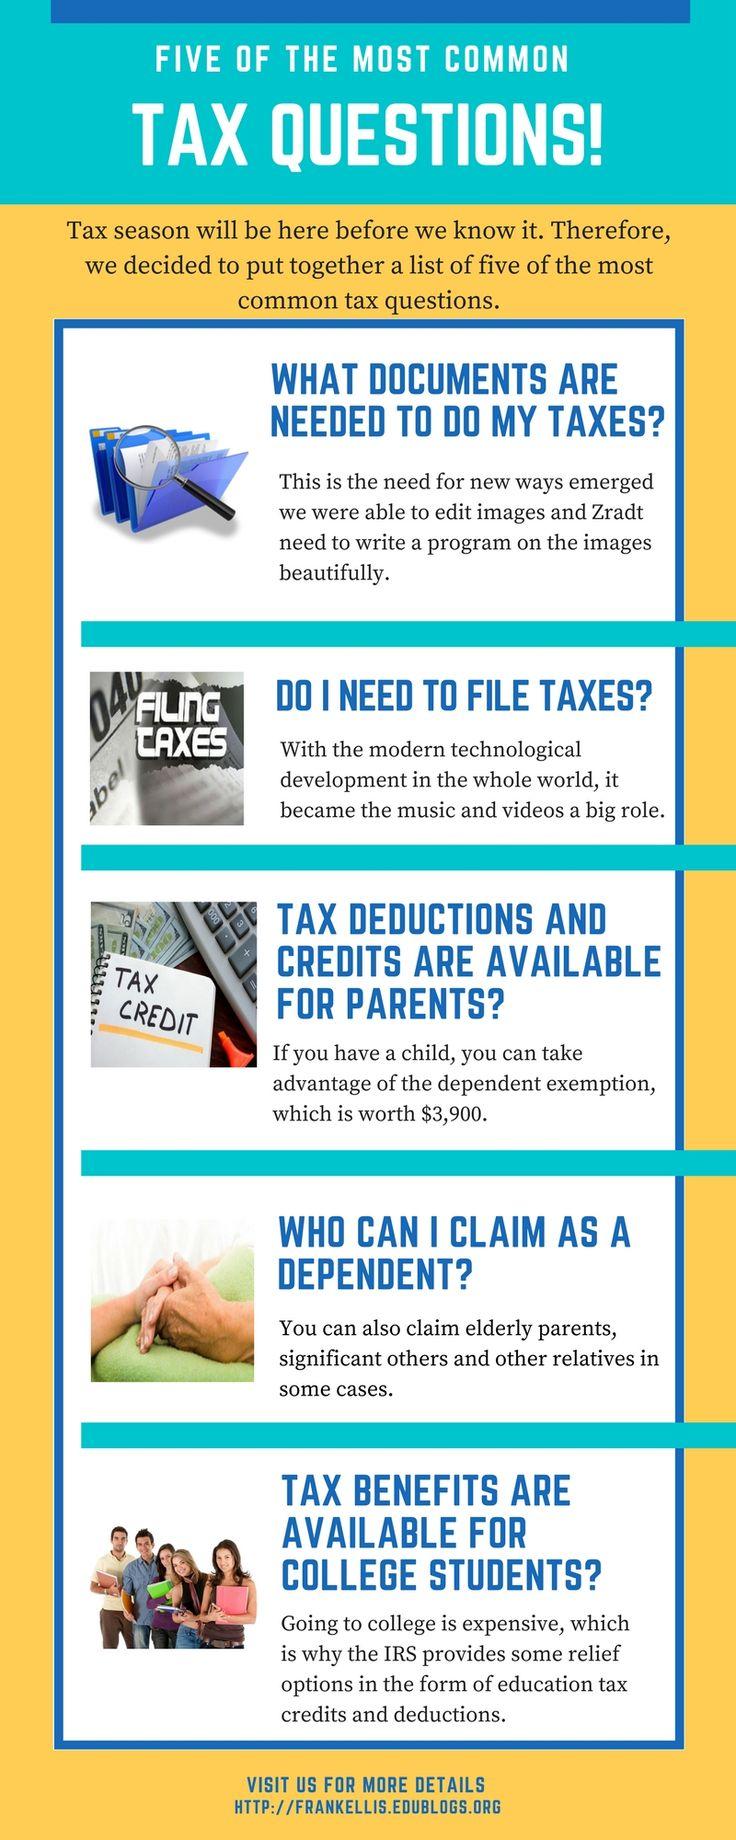 Best 25+ Tax questions ideas on Pinterest | Get post, Post it plus ...